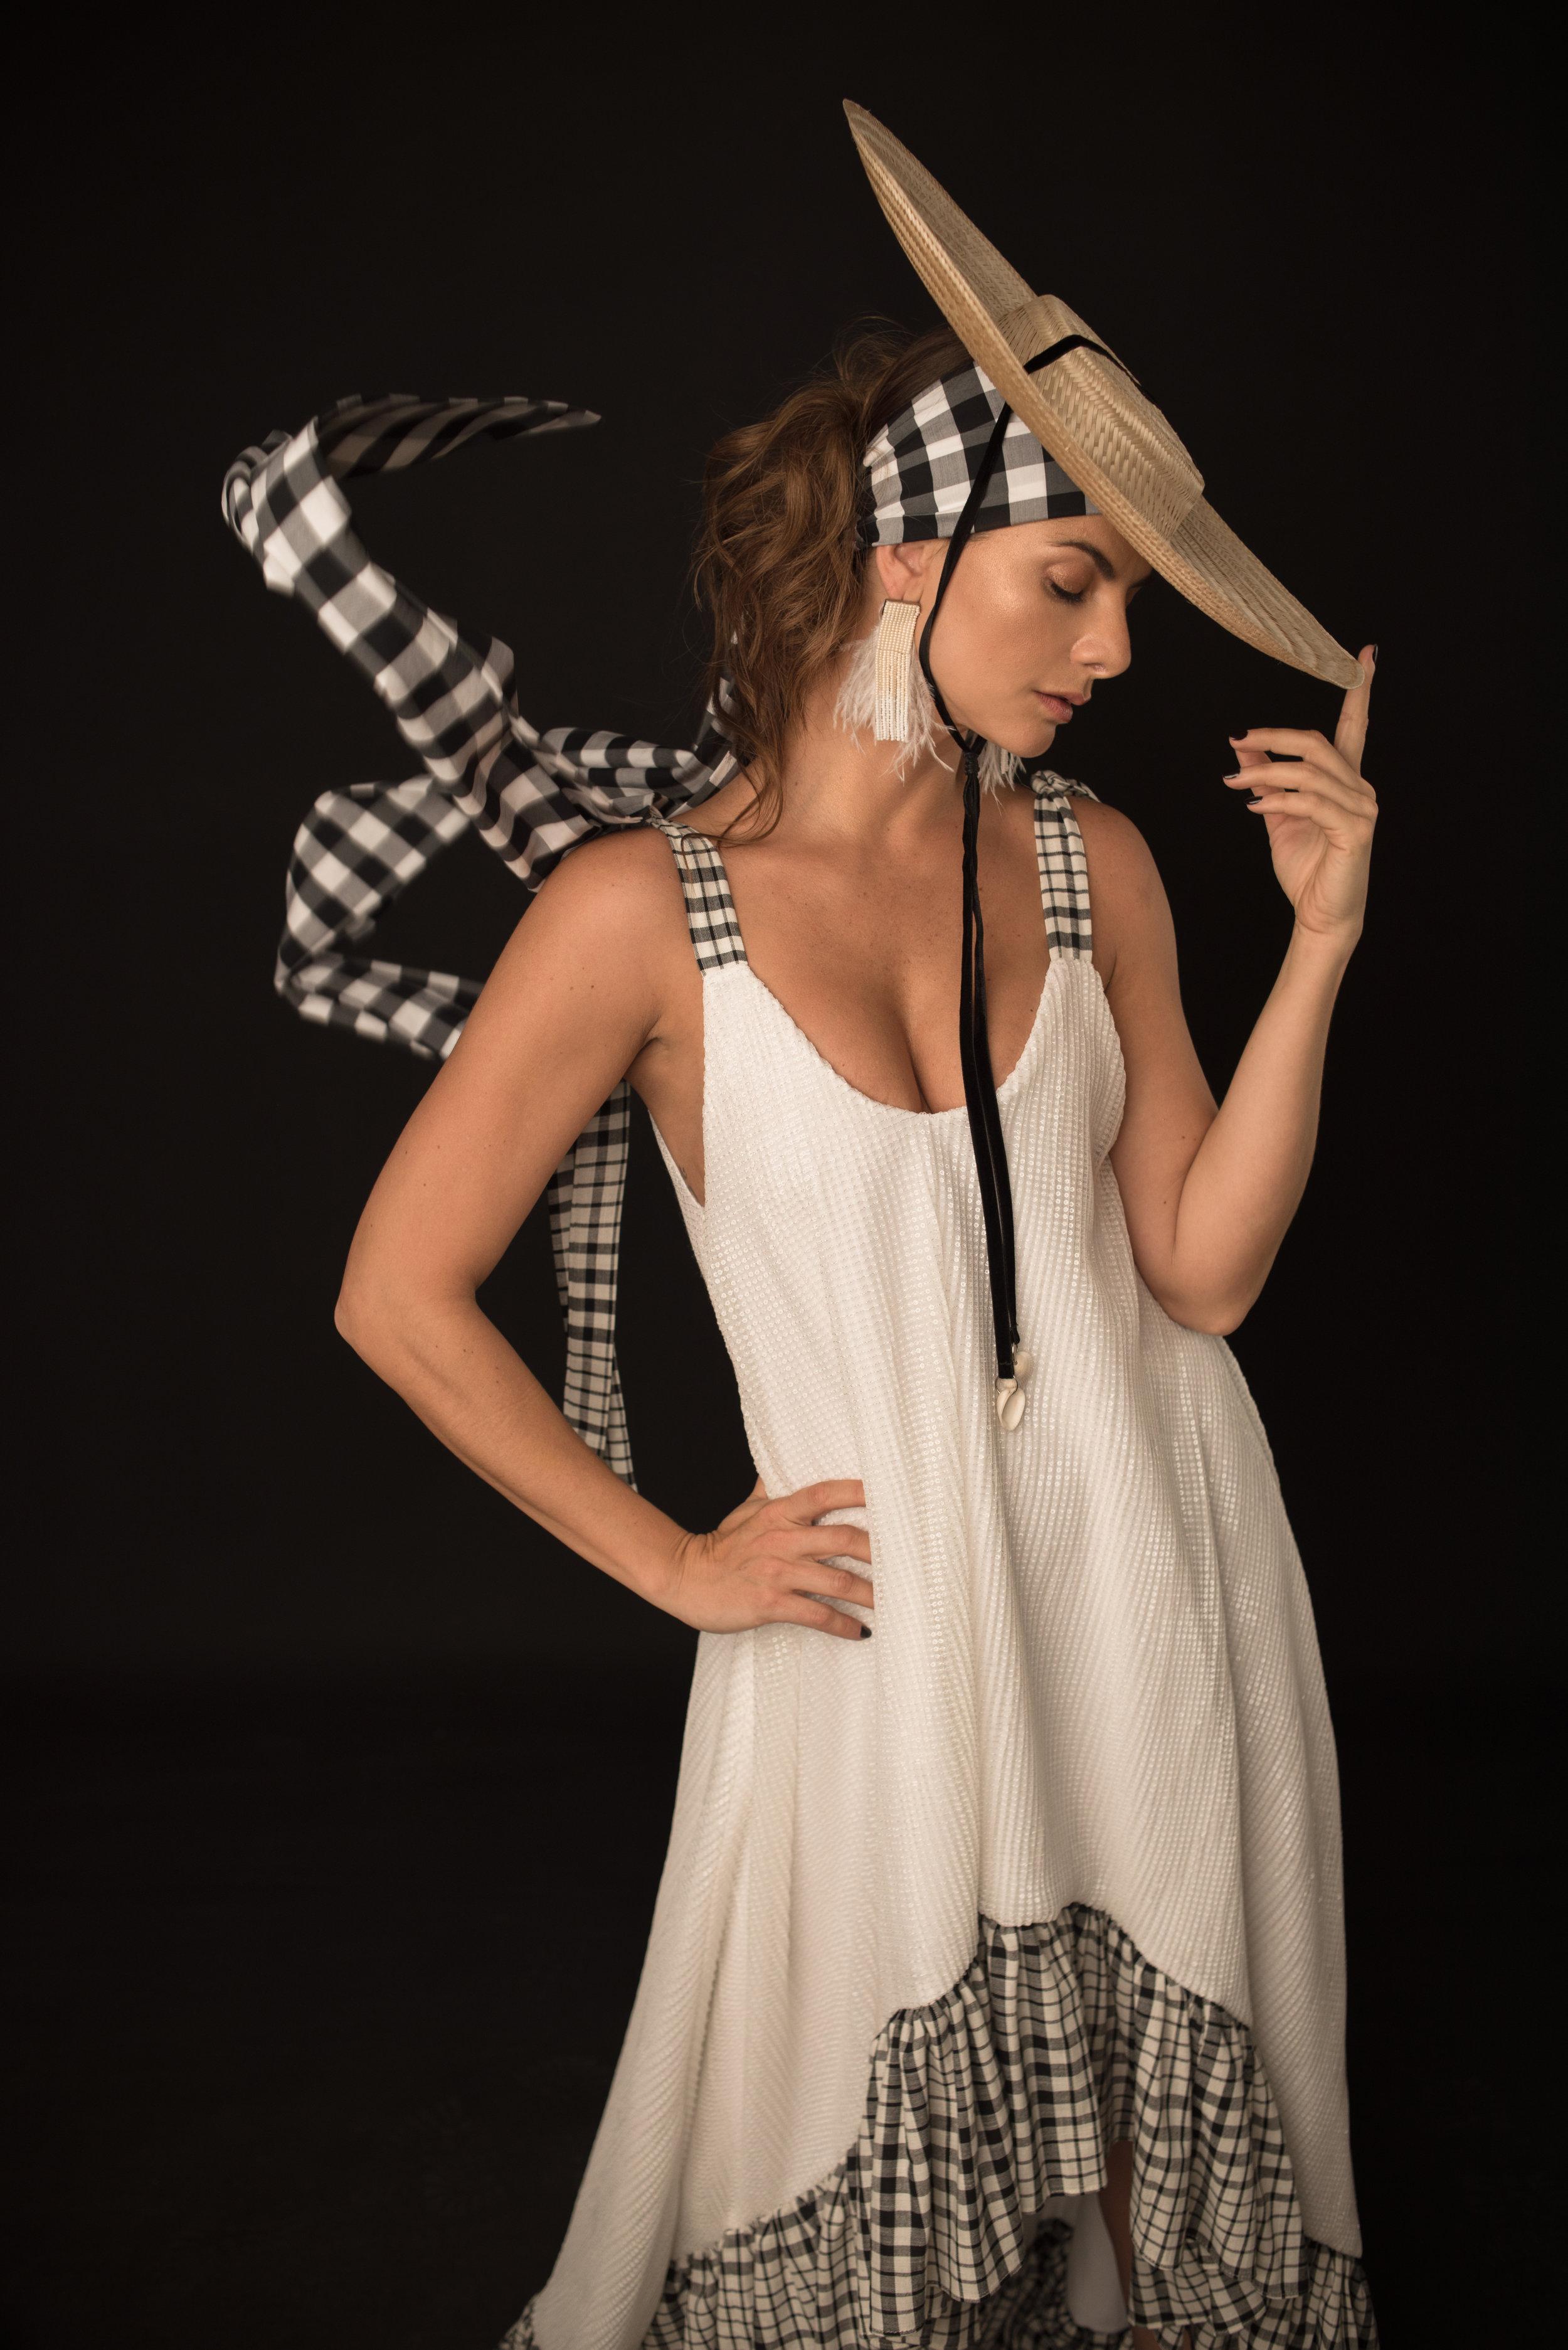 Dress. Alexandra Bueno / Hat. Roma Hatmakers for La Couture Maison / Earrings. Adriana Tavera